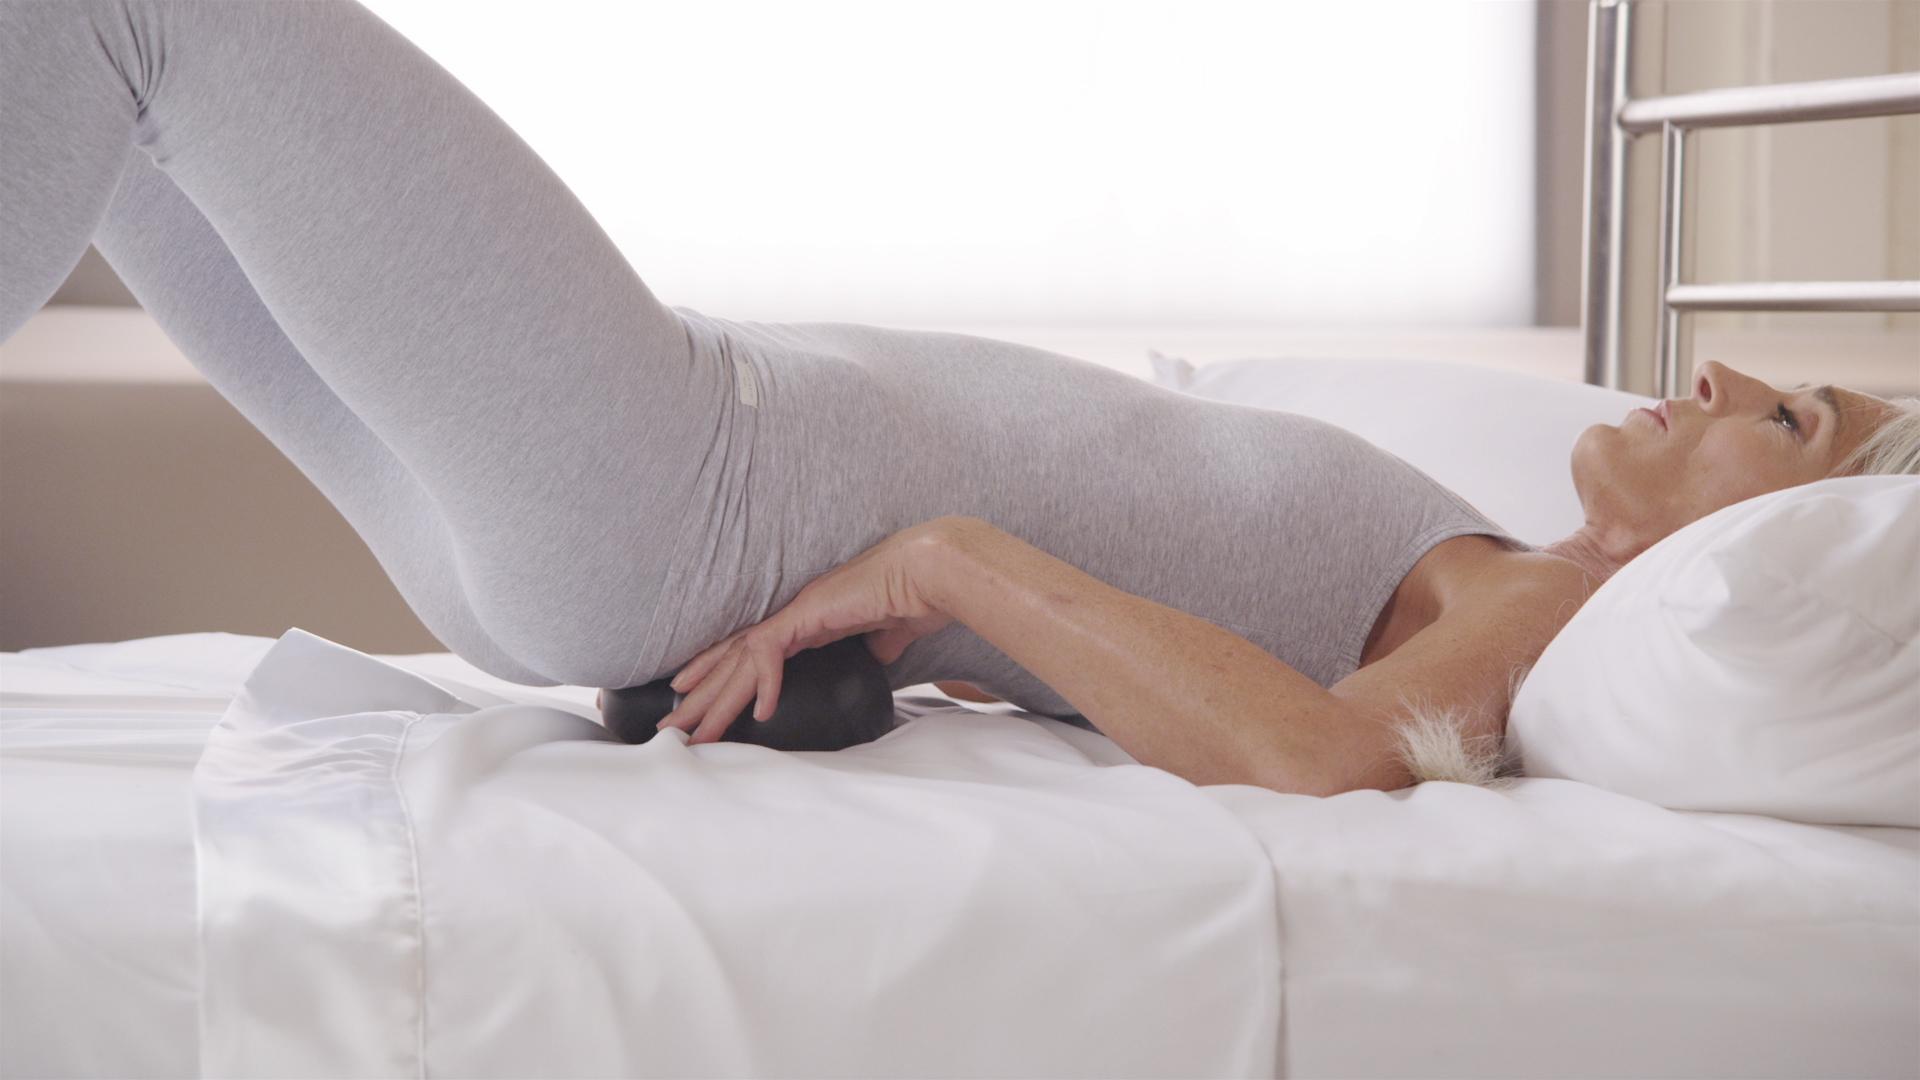 dayton accredited business directory massage therapists